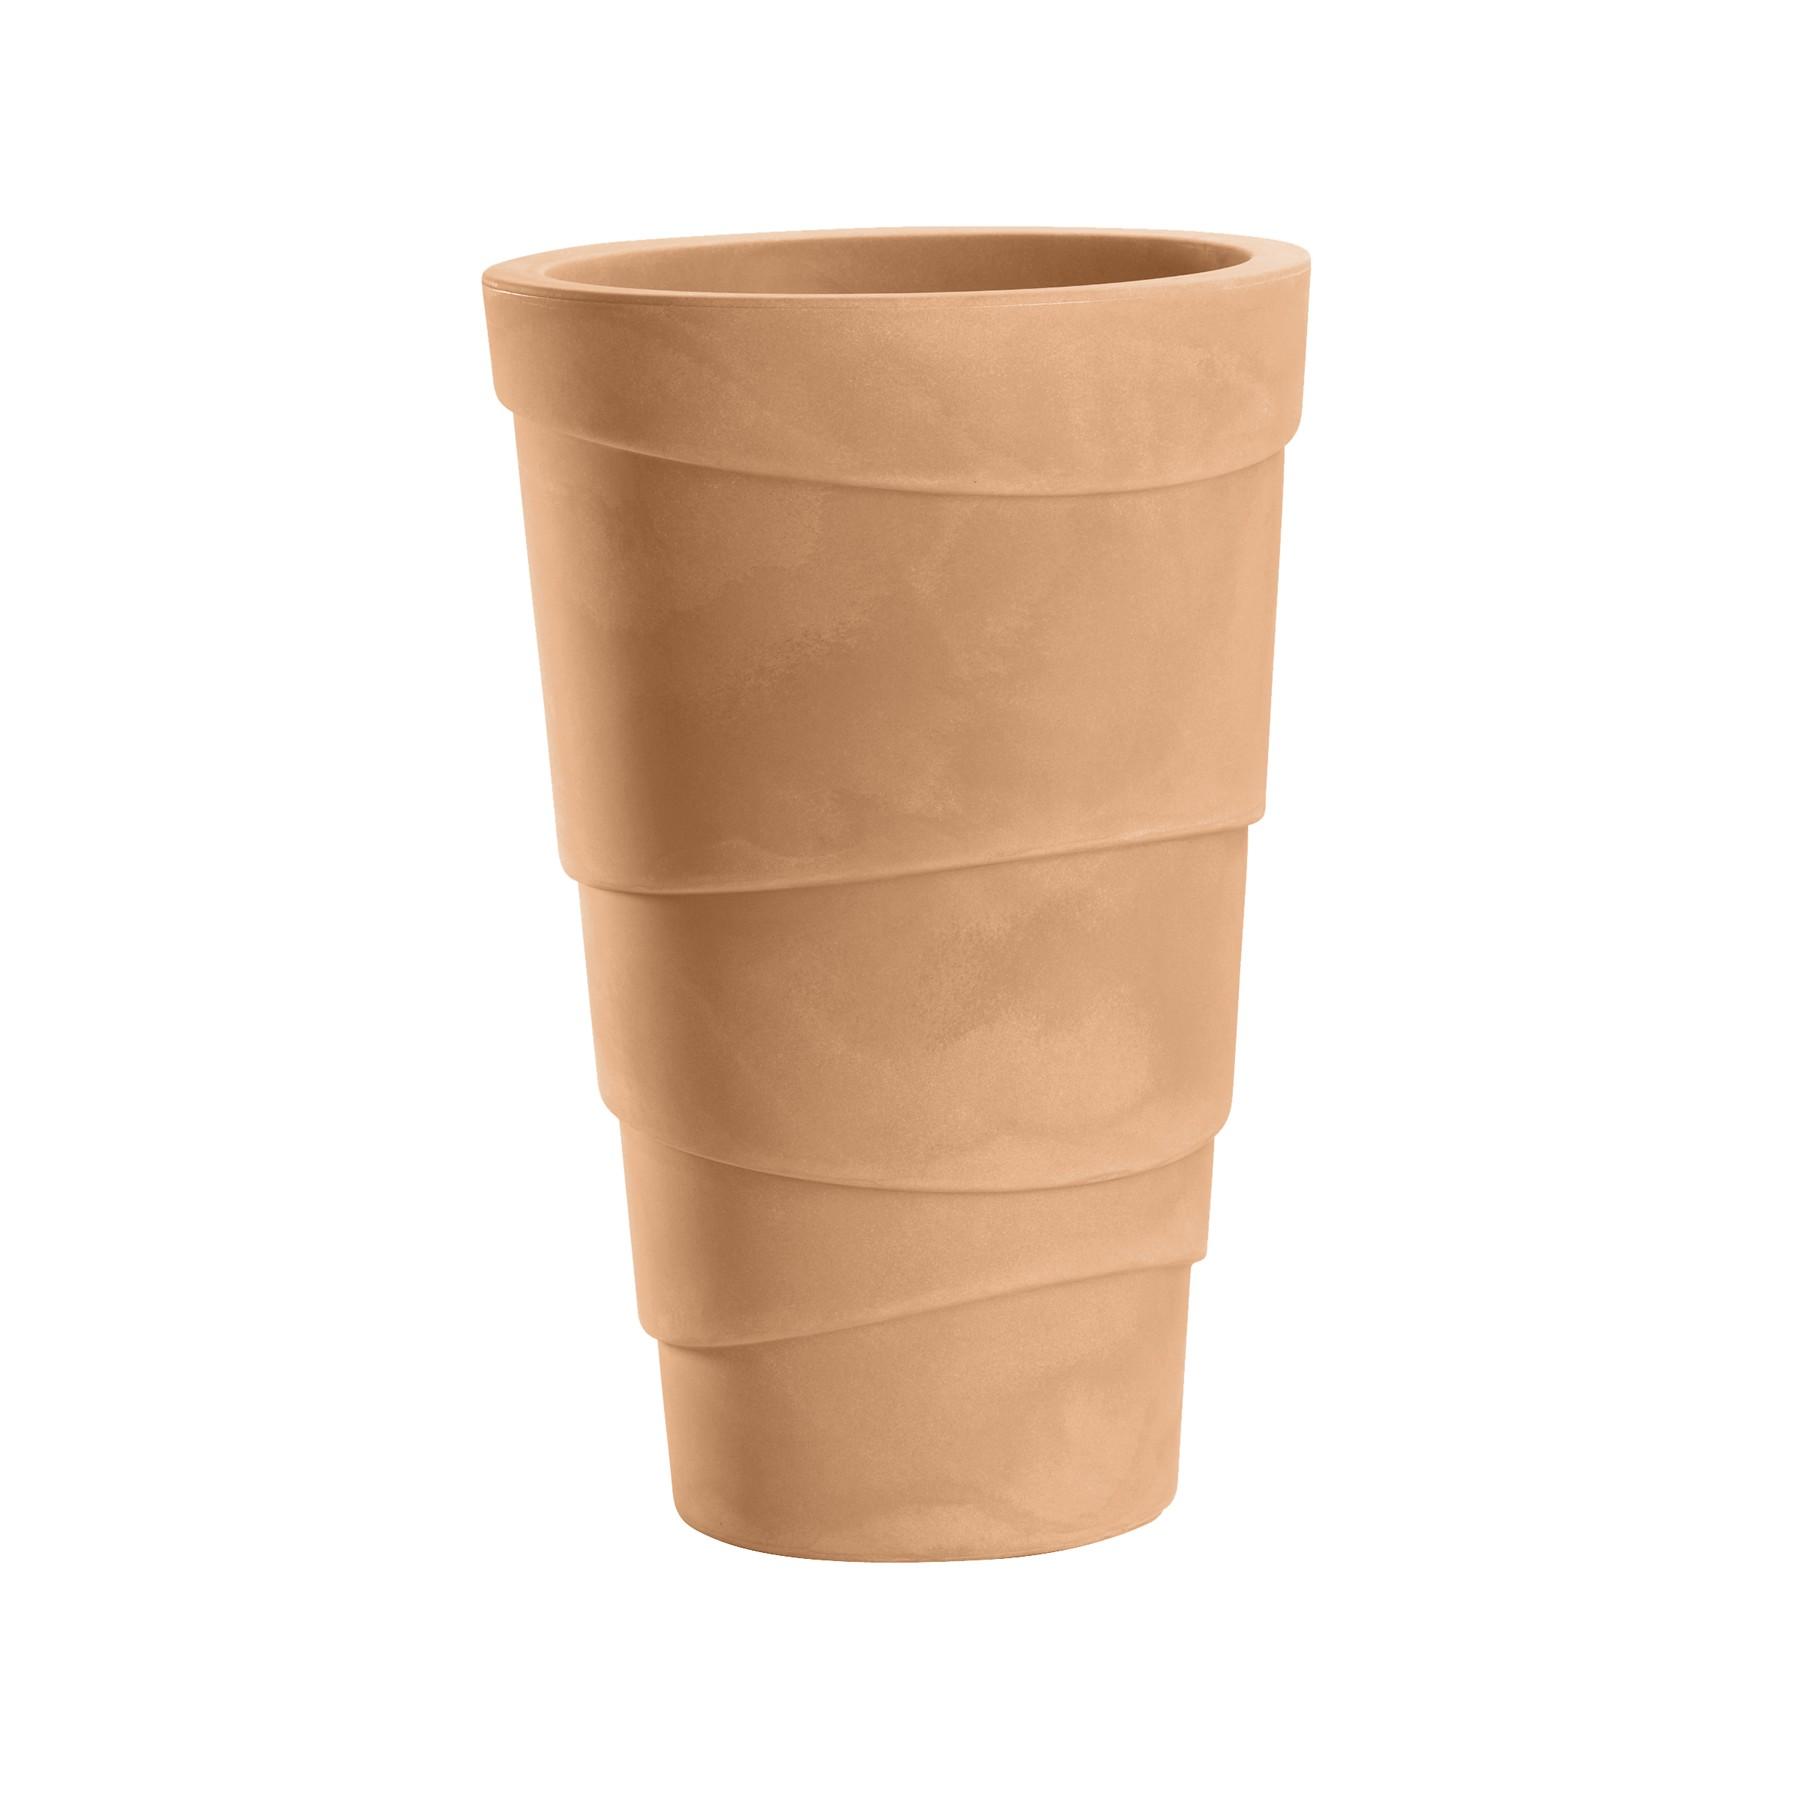 Vasi da giardino e casa in plastica zig zag nicoli - Vasi da giardino ...